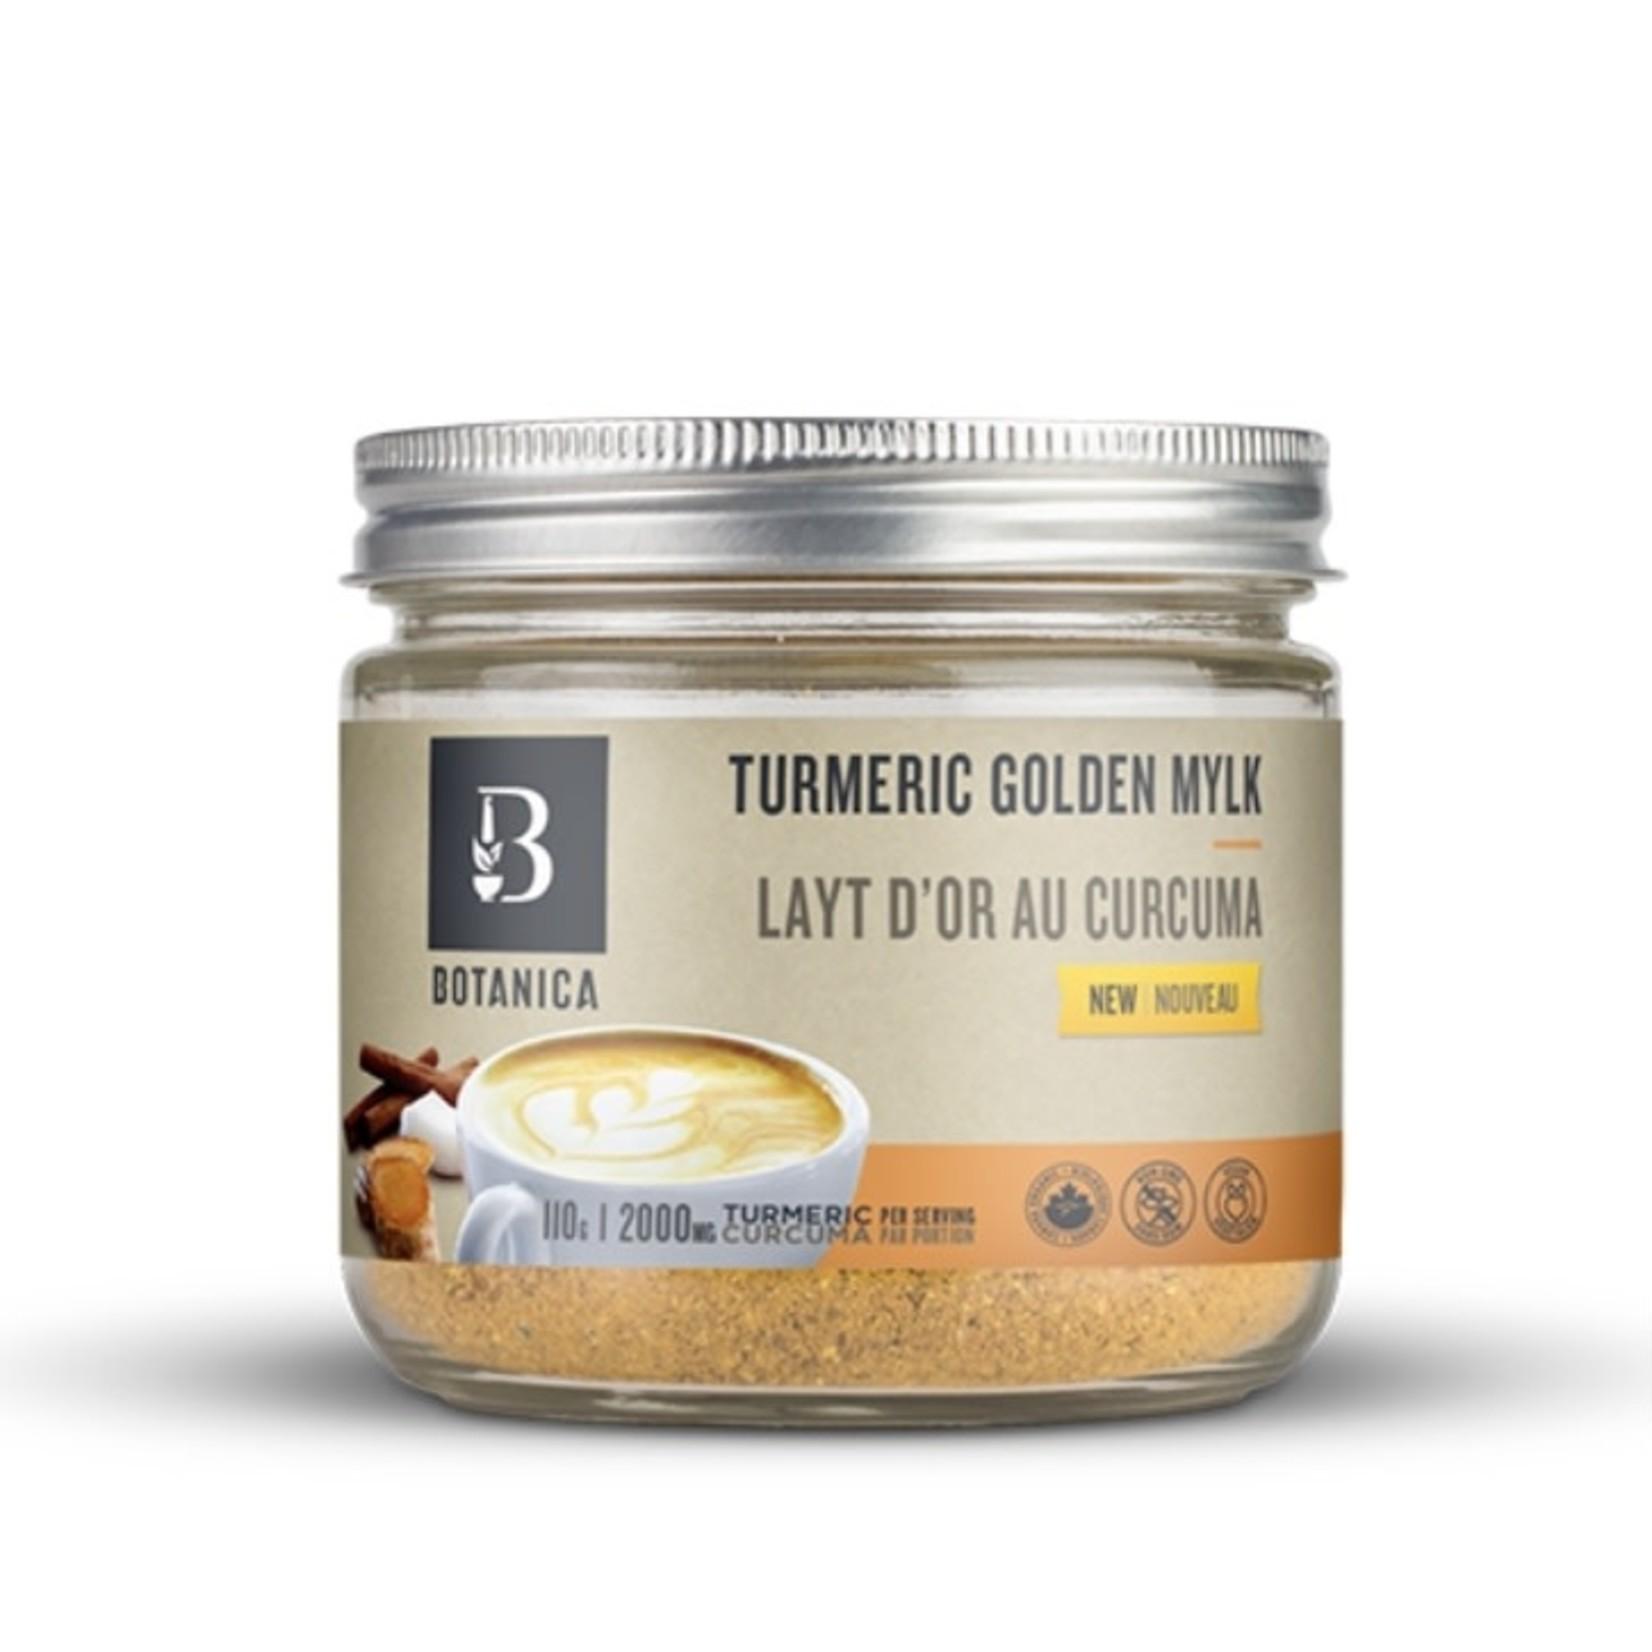 Botanica Botanica Turmeric Golden Mylk 110g